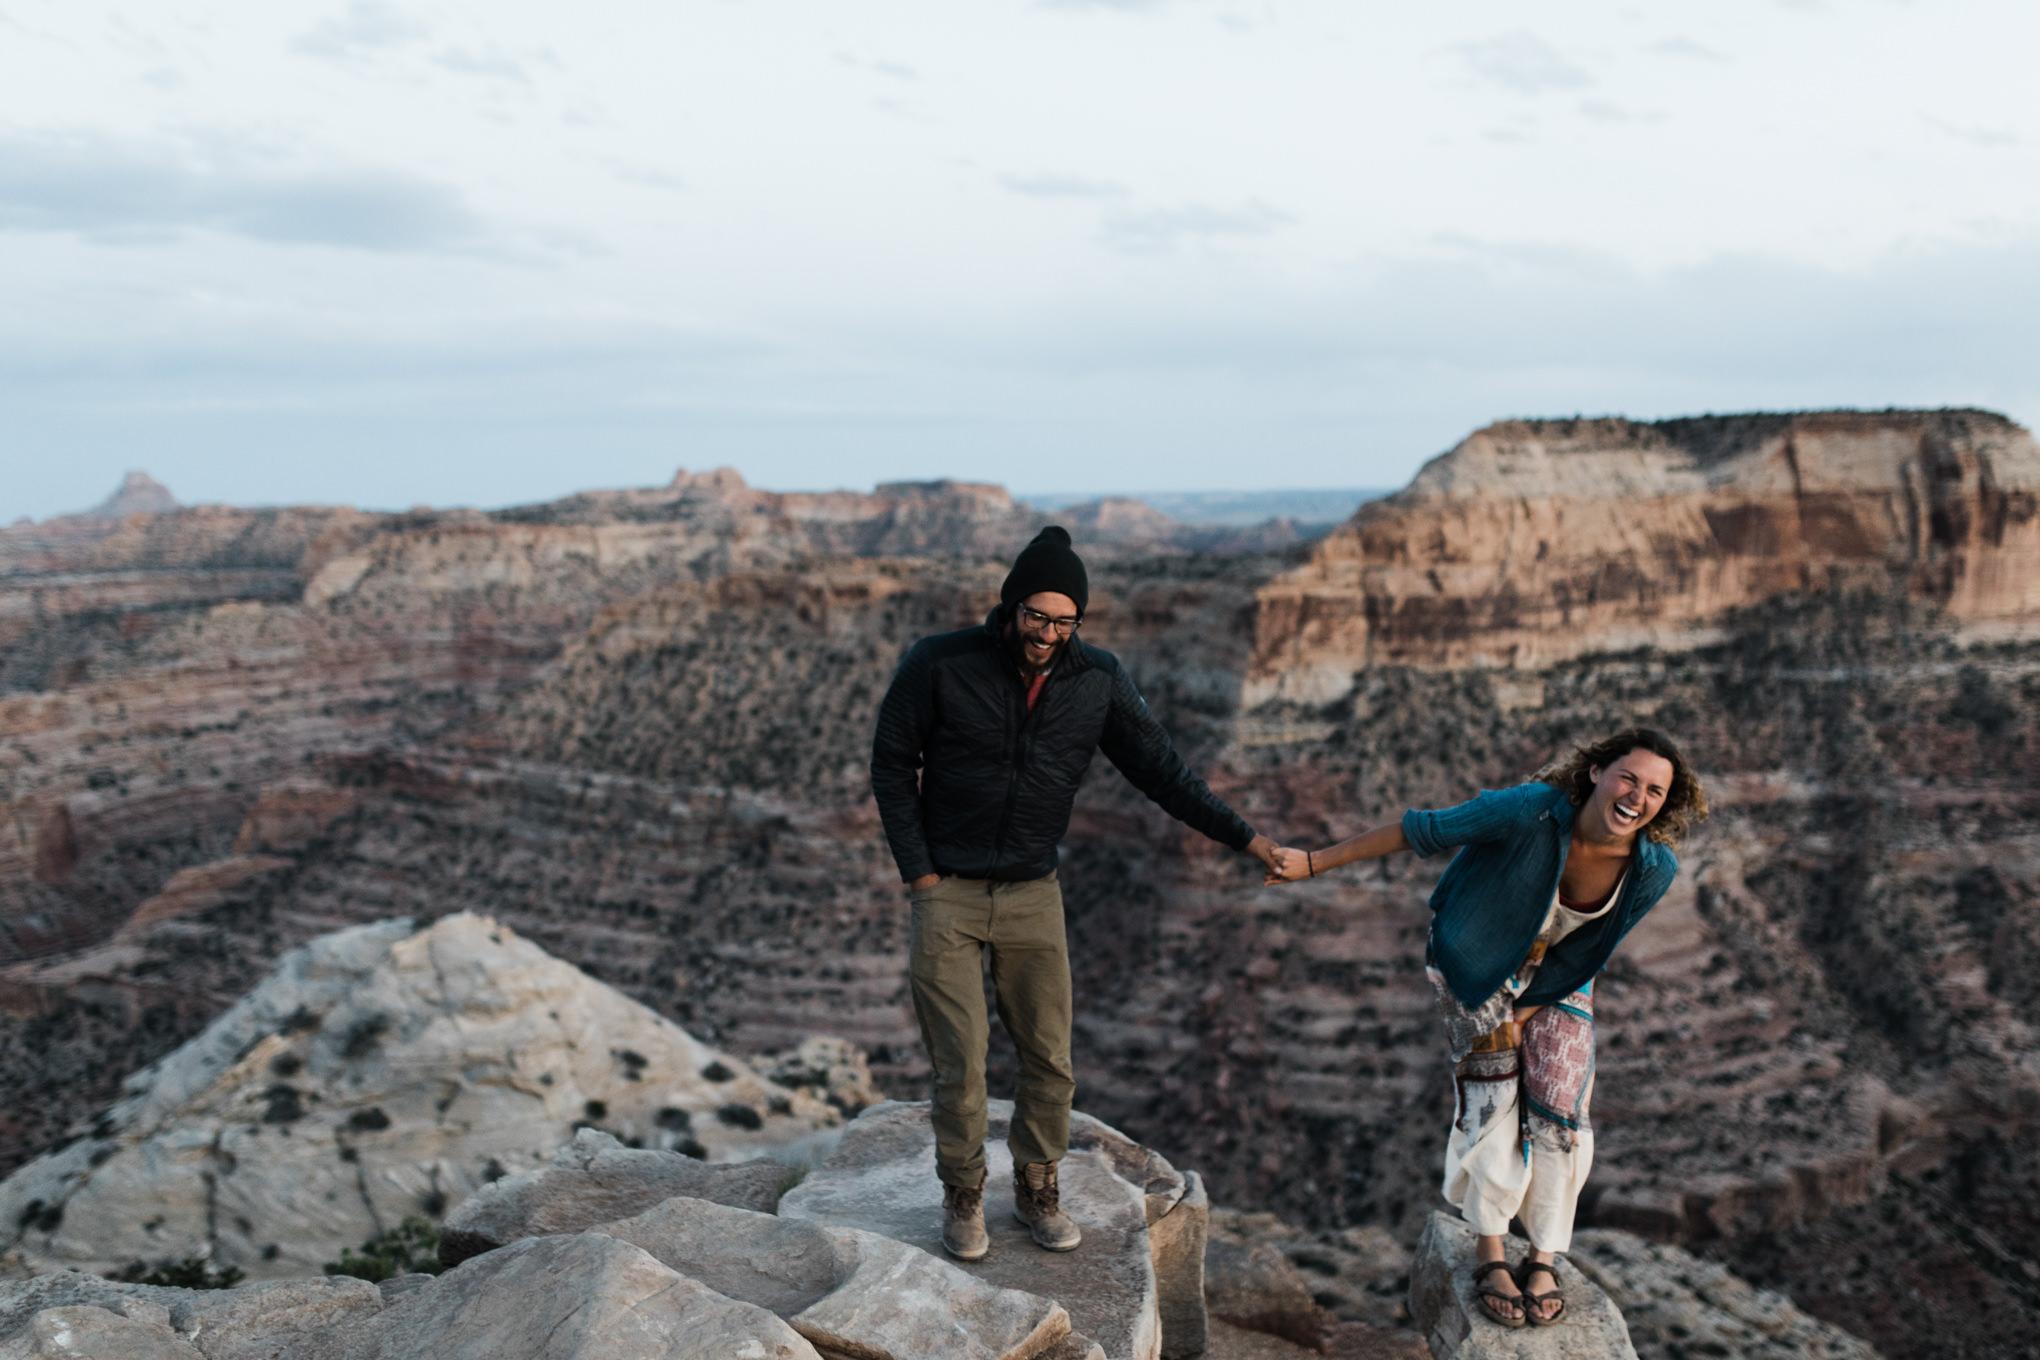 utah desert adventure session | destination engagement photo inspiration | utah adventure elopement photographers | the hearnes adventure photography | www.thehearnes.com